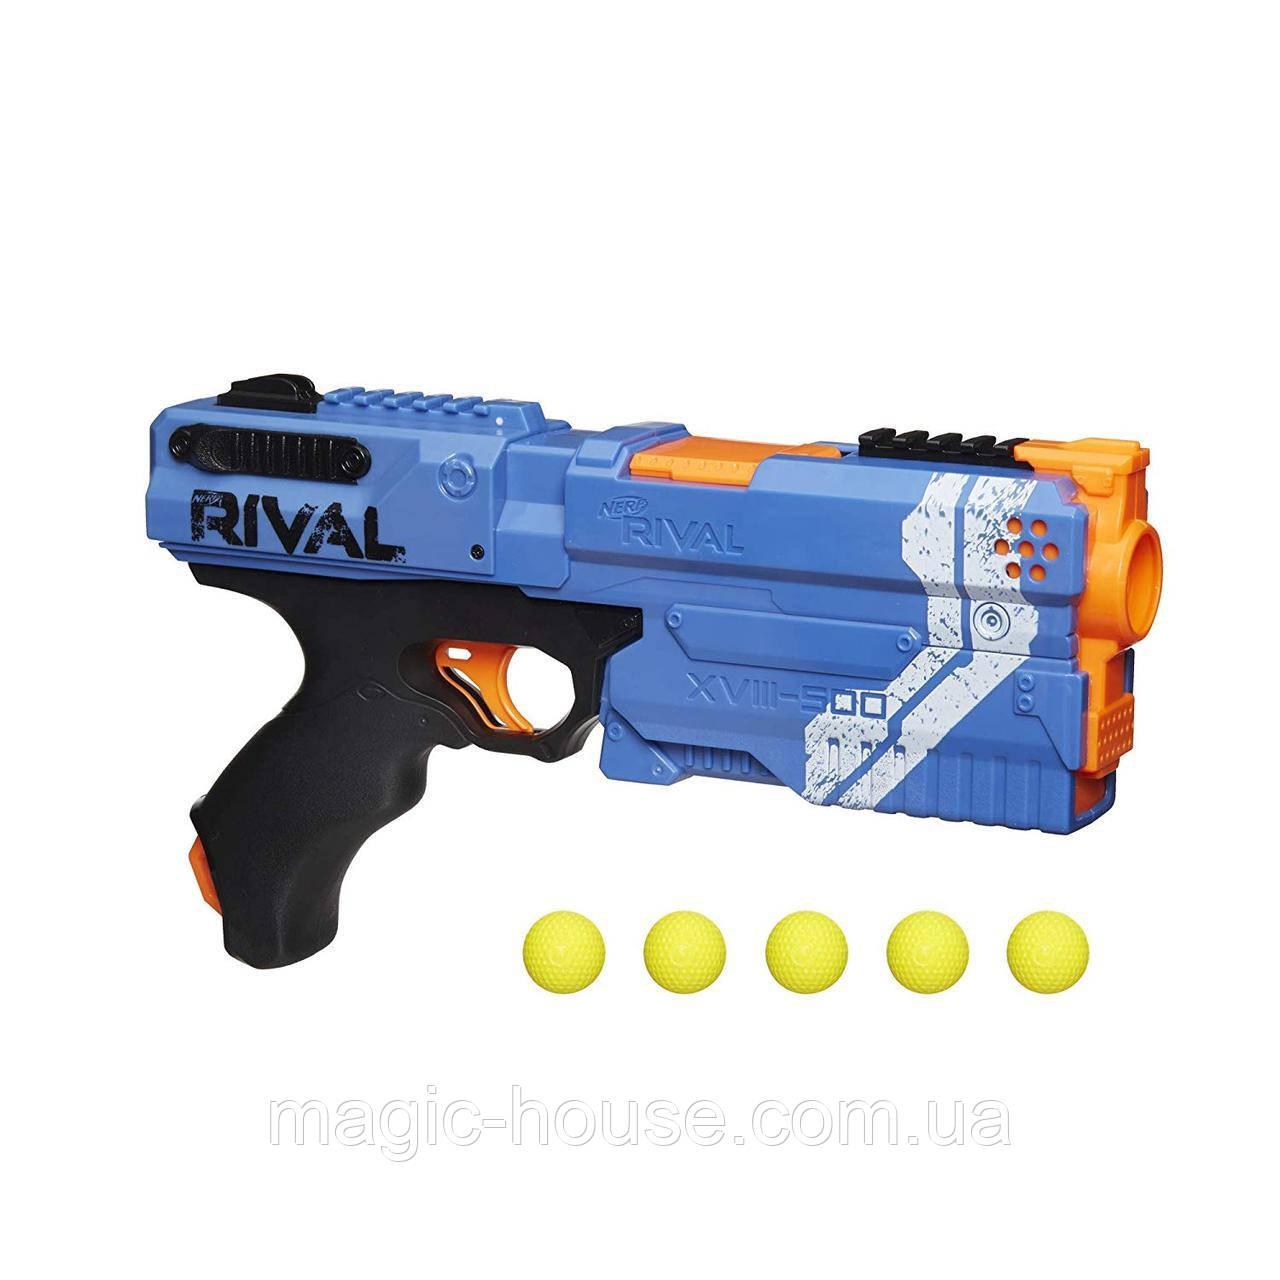 Бластер Нерф Райвел Фантом Кронос NERF Rival Kronos Xviii-500 (Blue) ОРИГІНАЛ